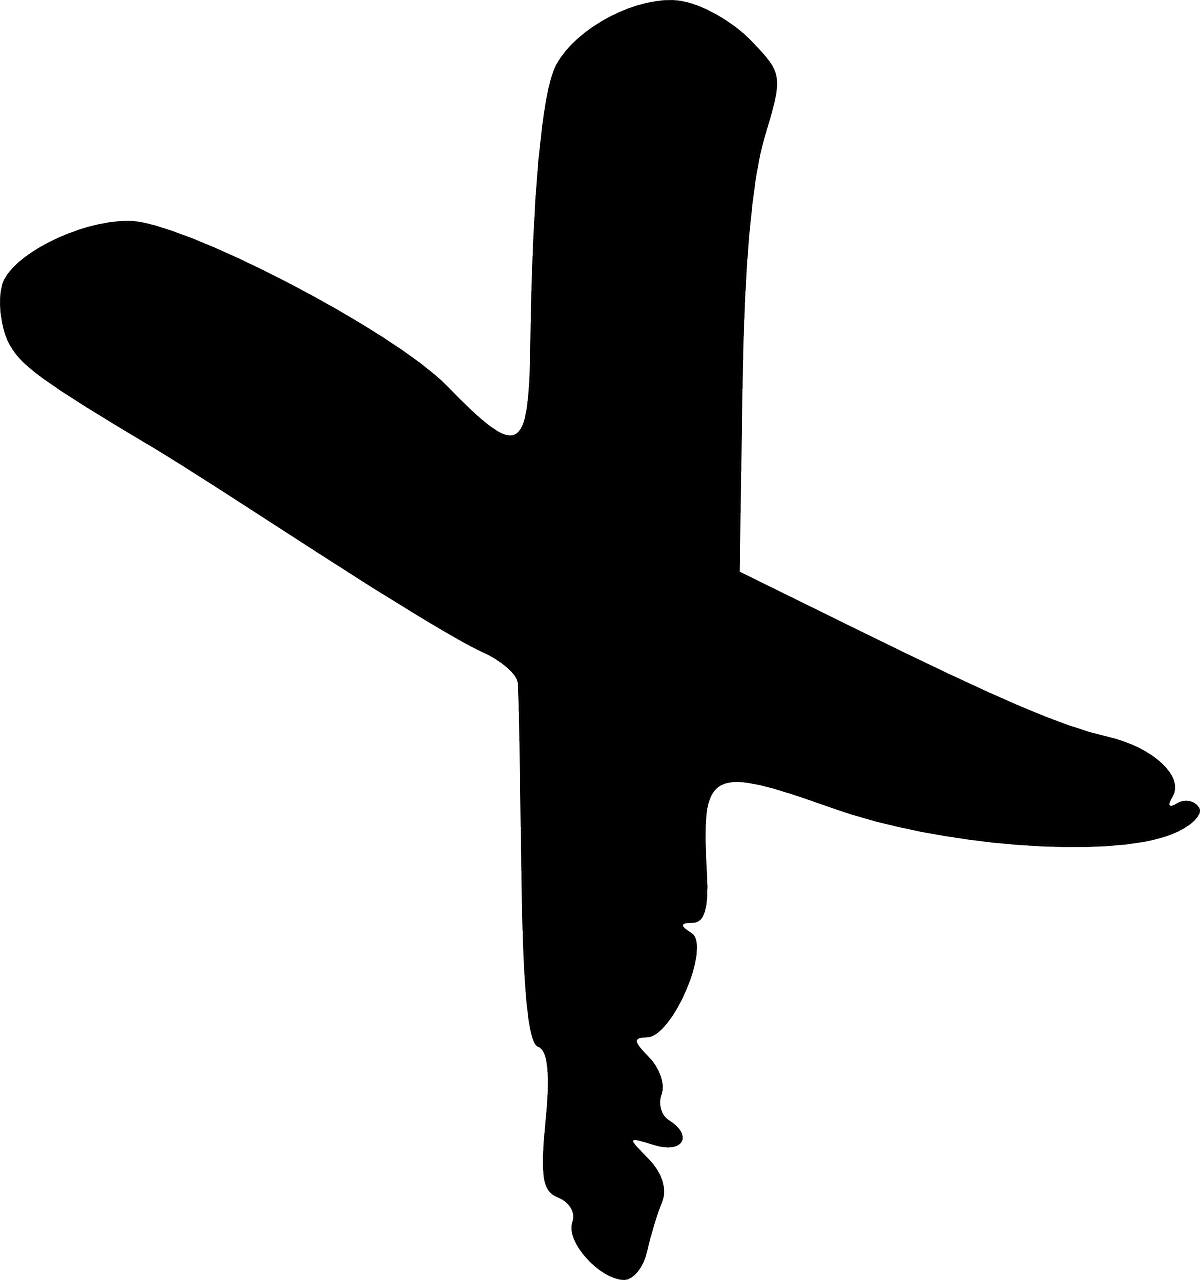 clipart black and white download Clip art chopstick transprent. Chopsticks clipart drawing.